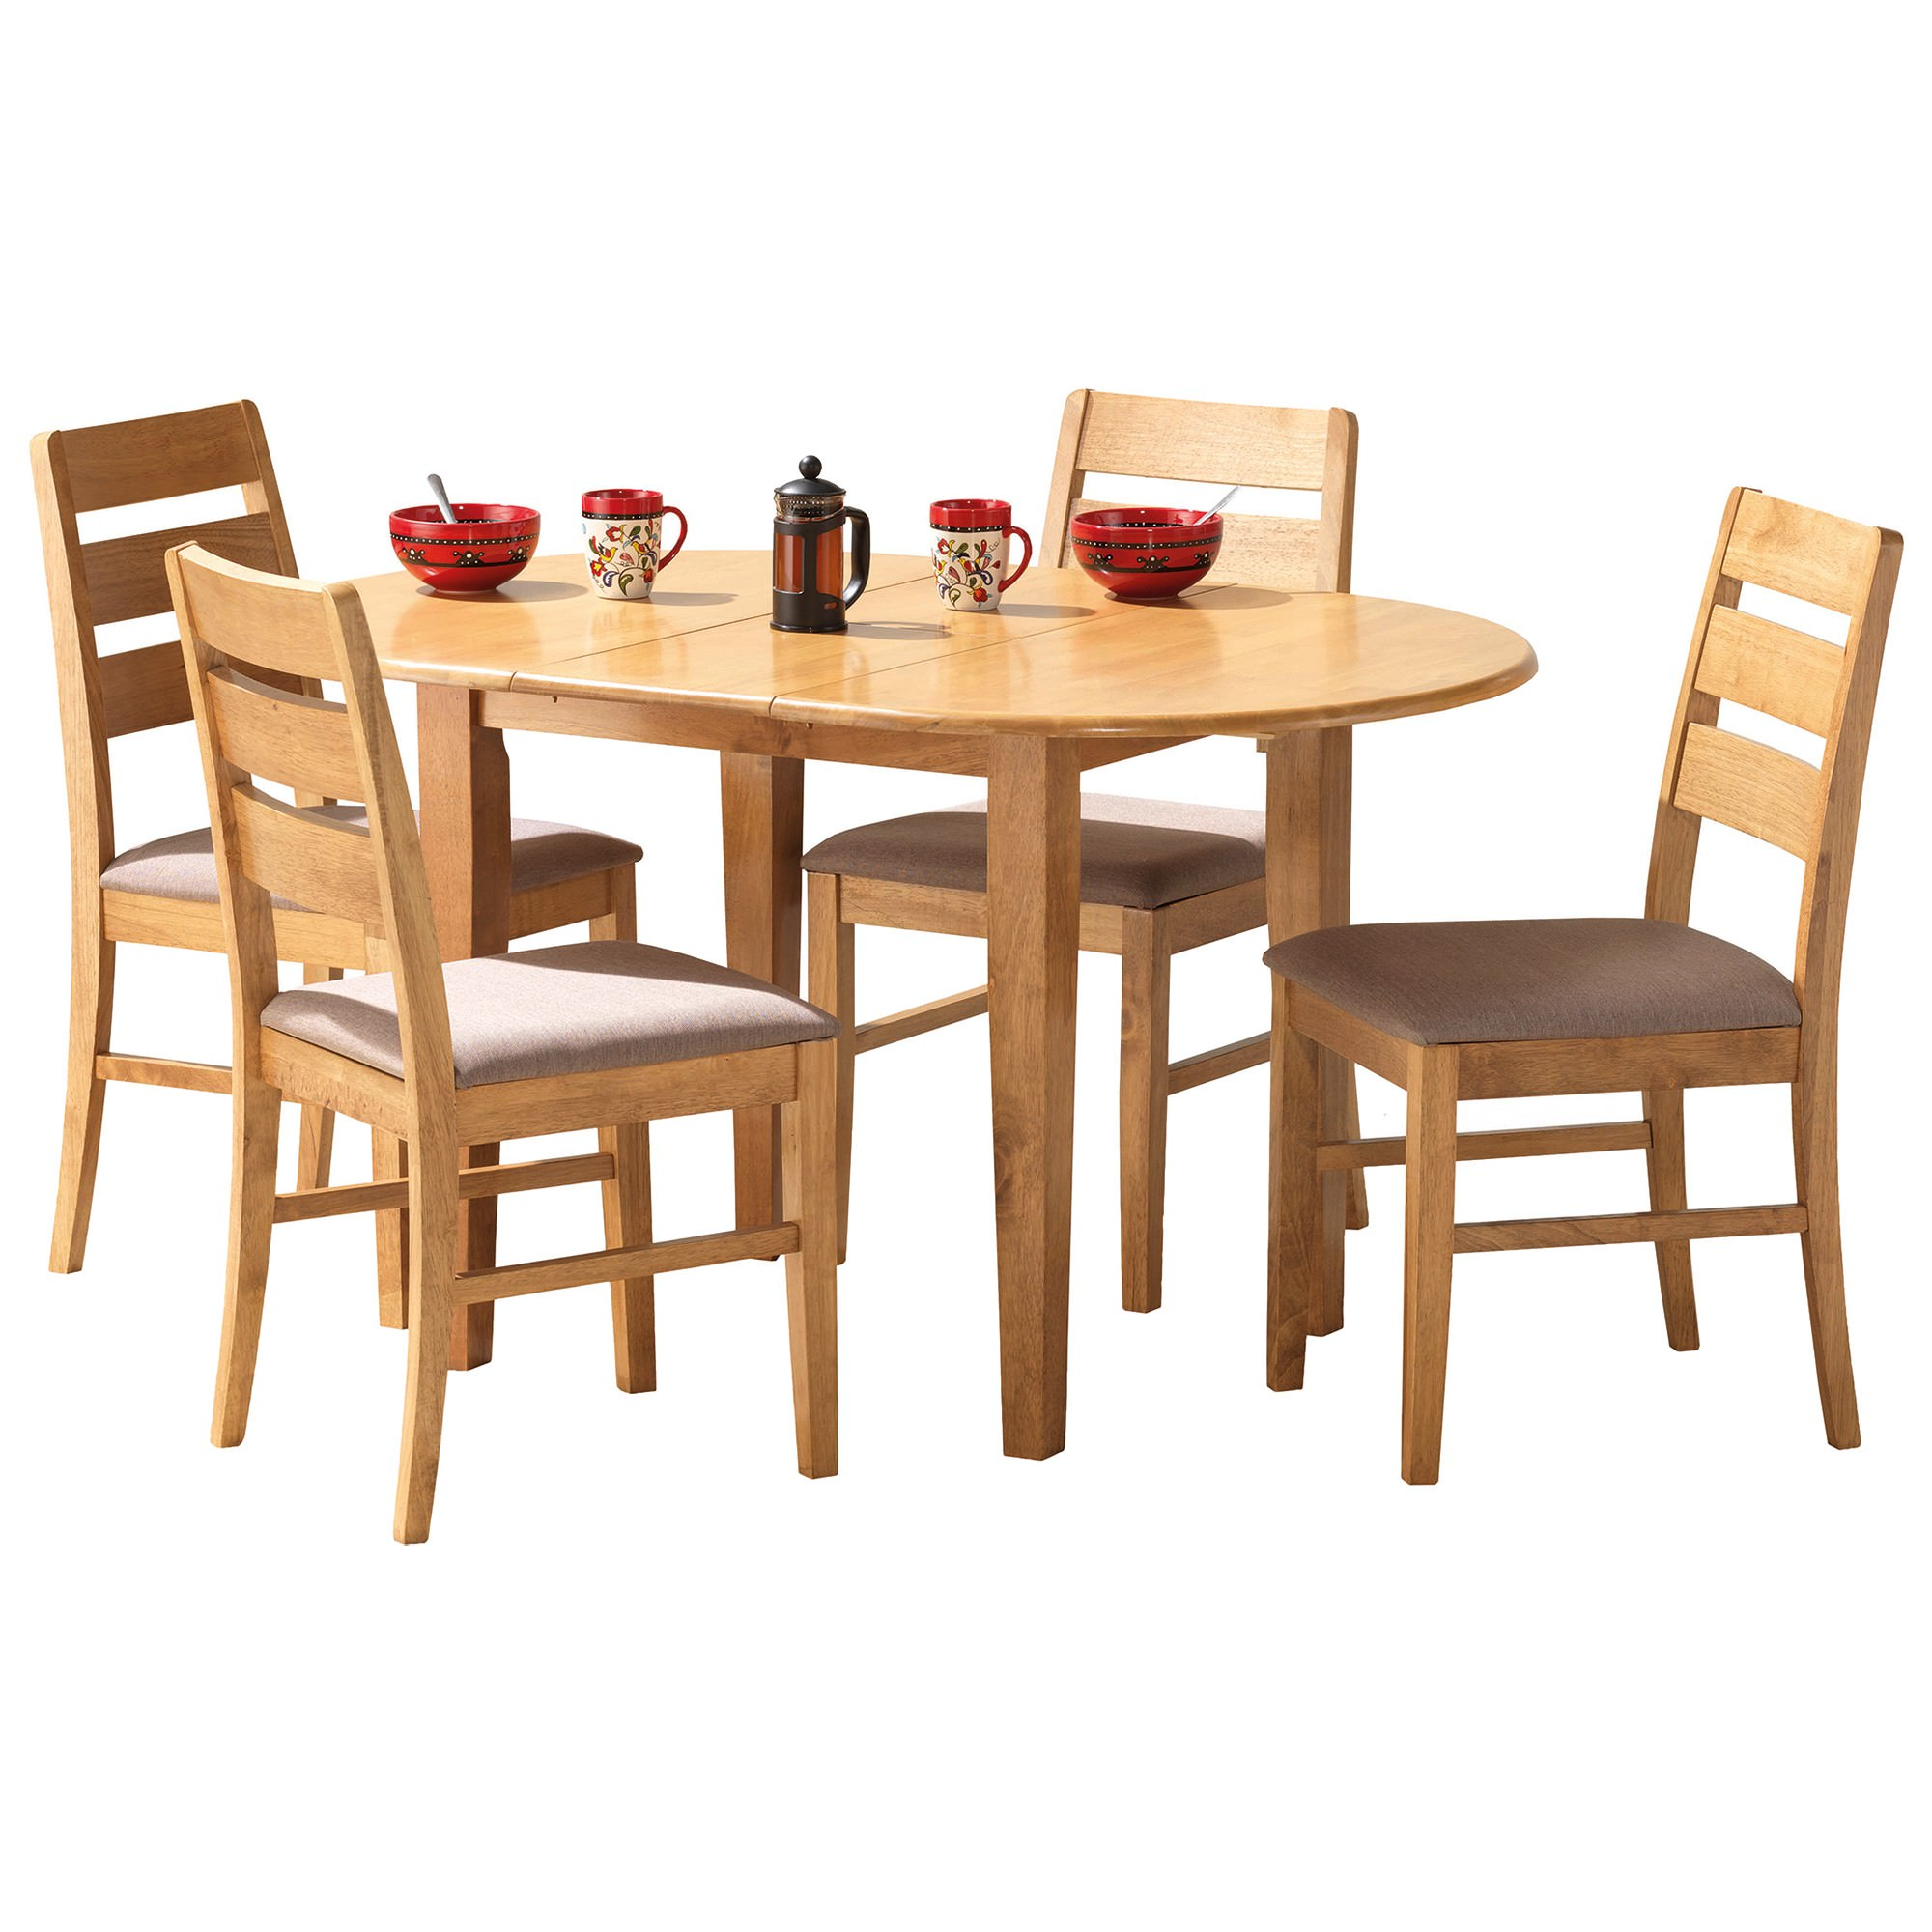 Tapas 5 Piece Rubberwood Timber Extension Dining Table Set, 105-135cm